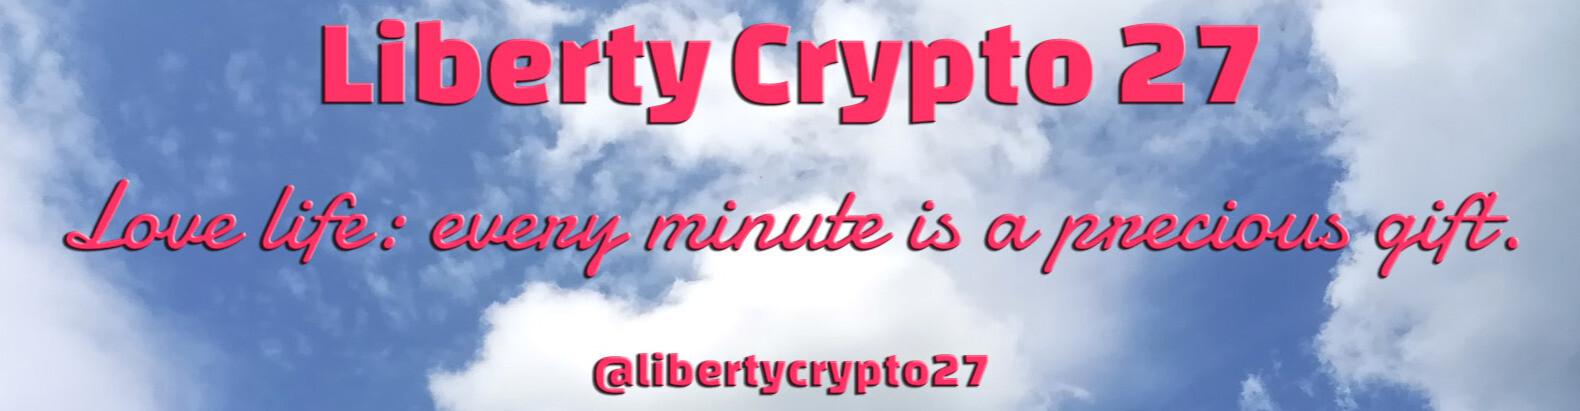 Libertycrypto27